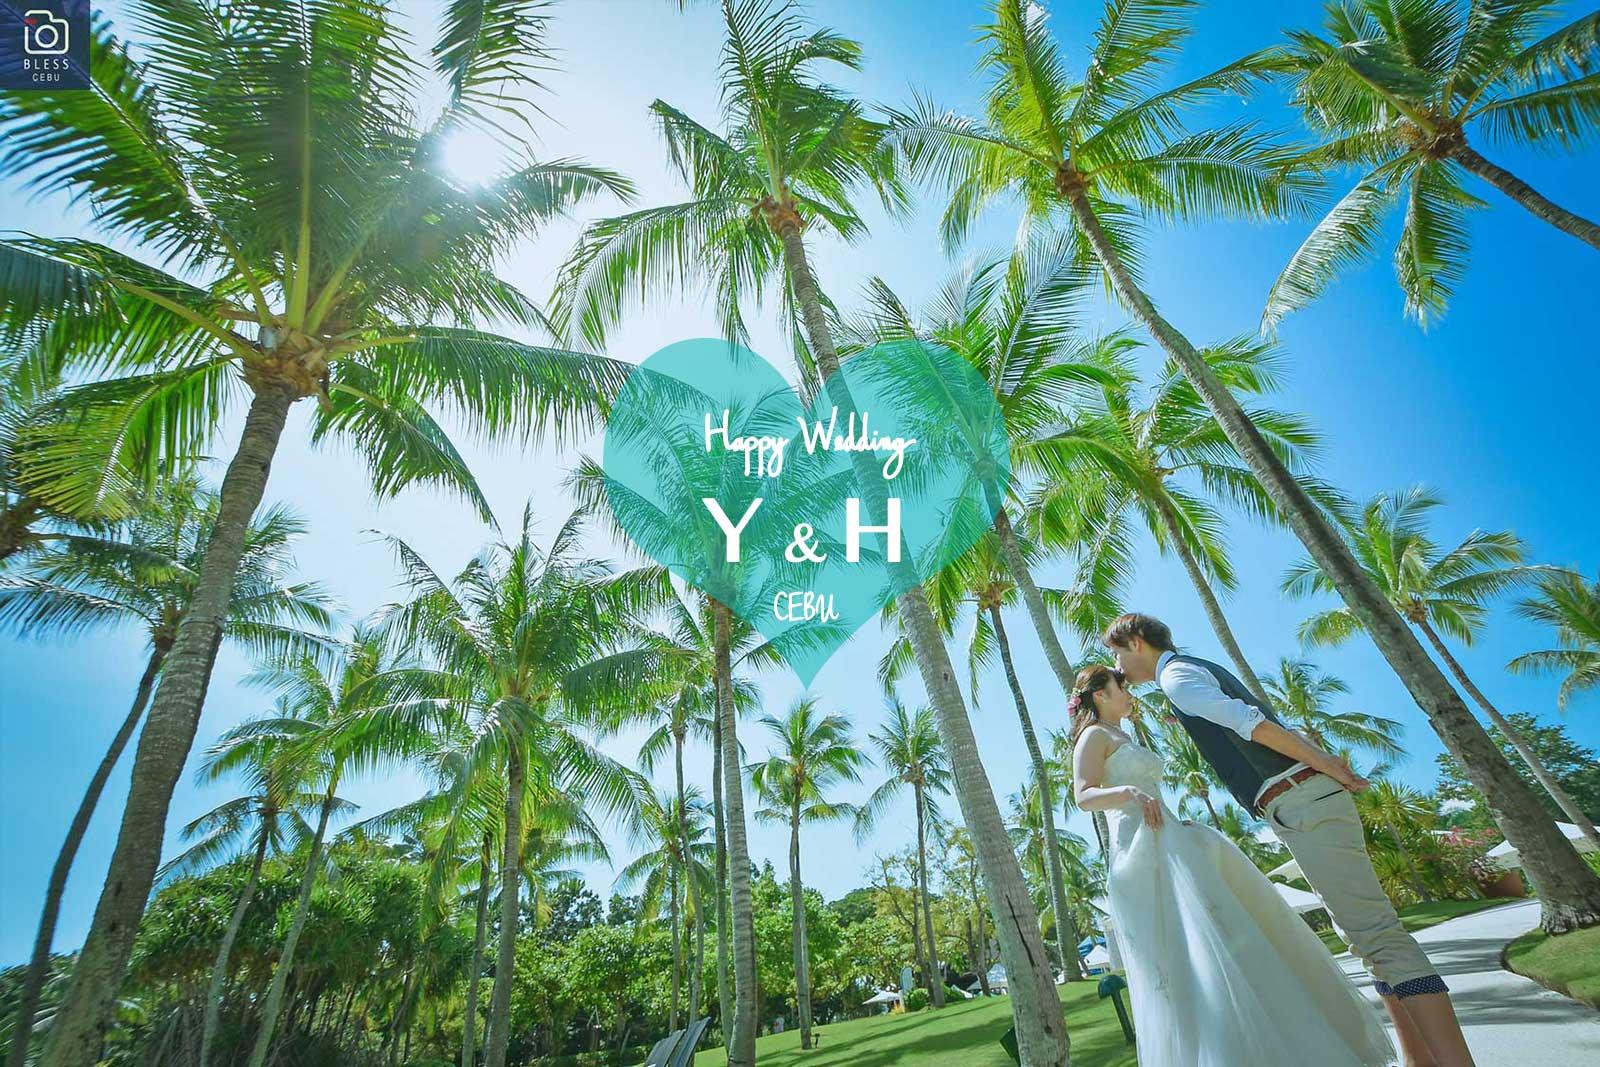 Y&H様のロケーションフォト